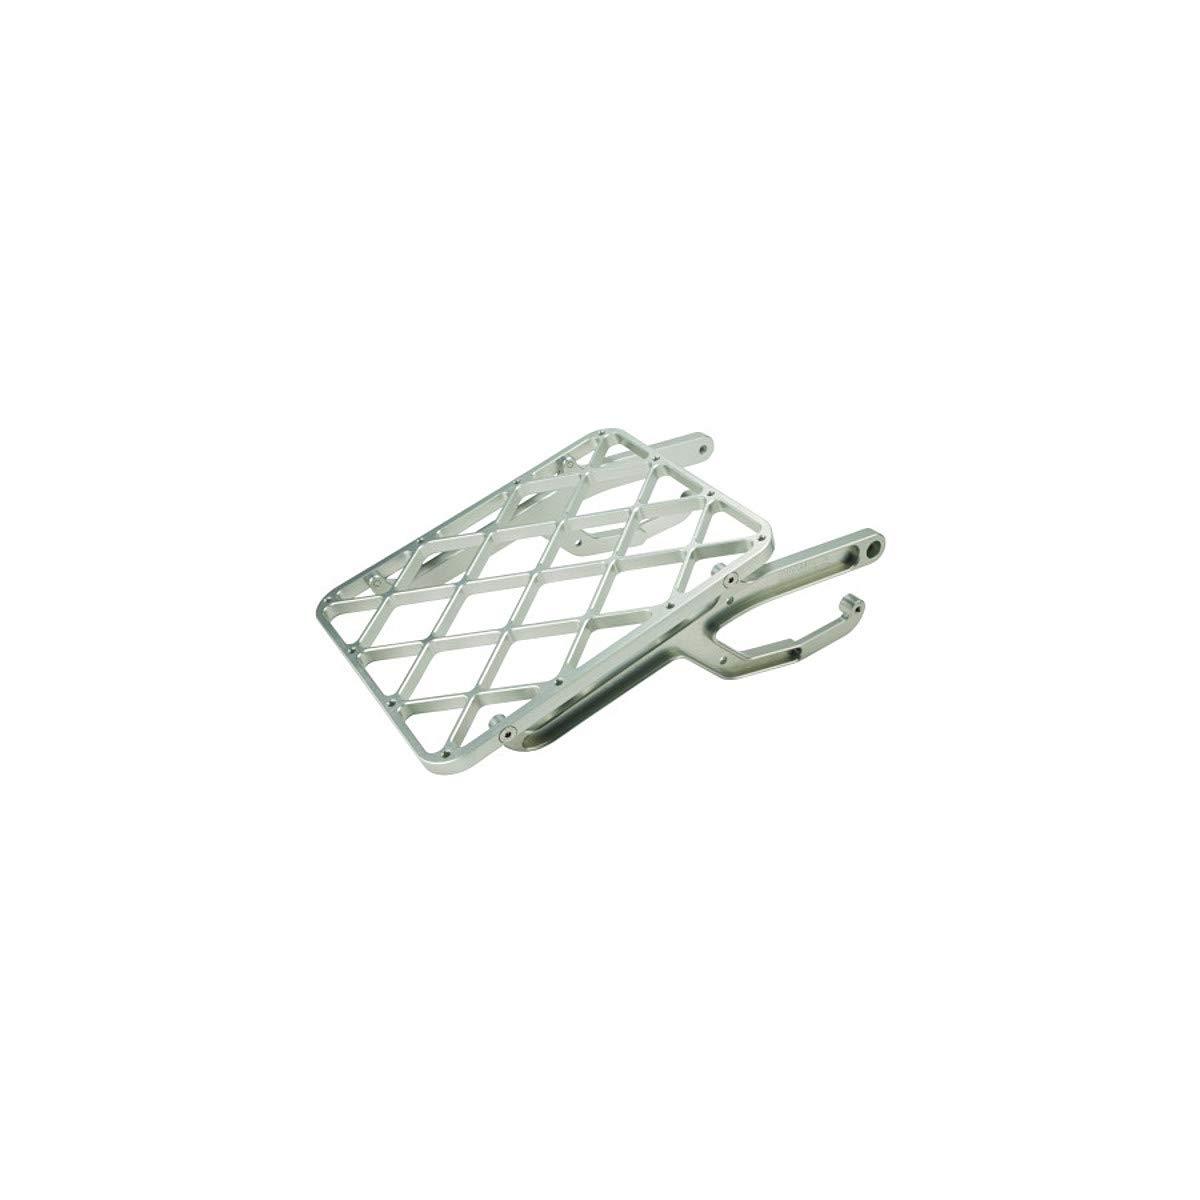 Pro Moto Billet Rack-It Cargo Rack 00-07 SUZUKI DRZ400E Silver